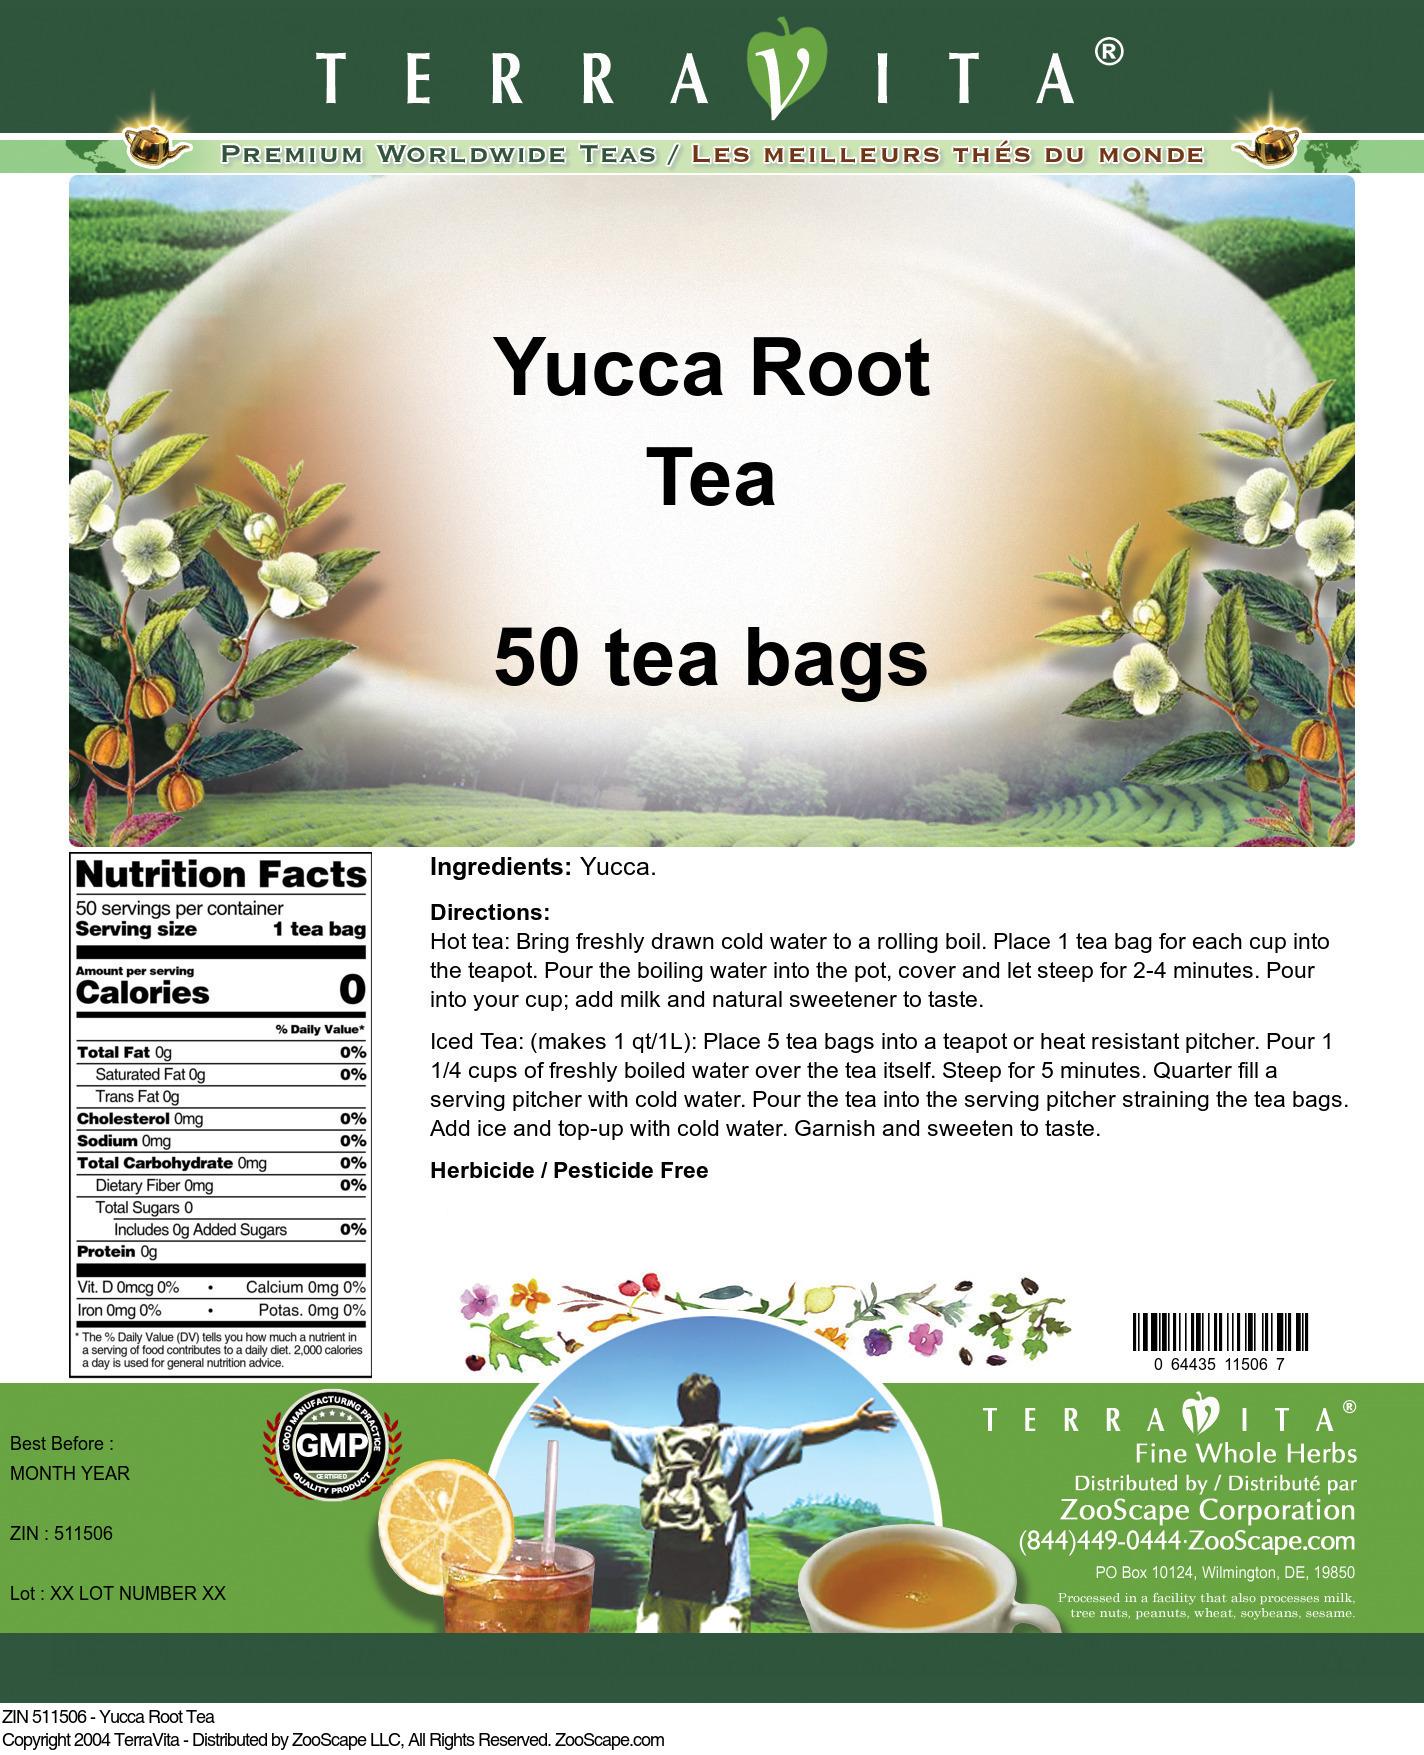 Yucca Root Tea